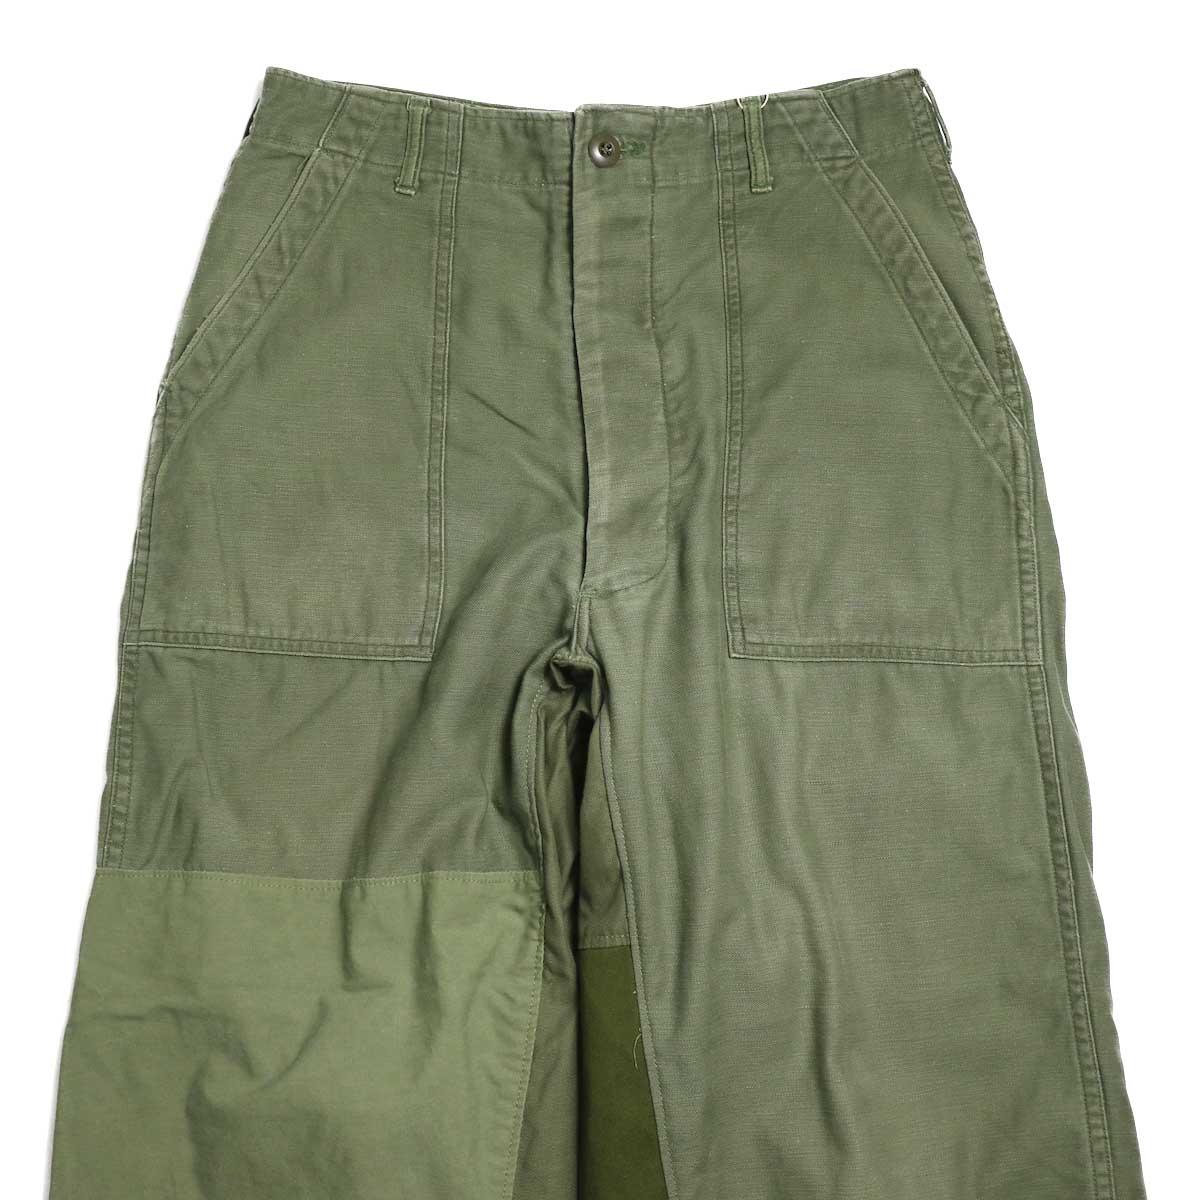 BONUM / Military FAT Pants (Btype) 股上